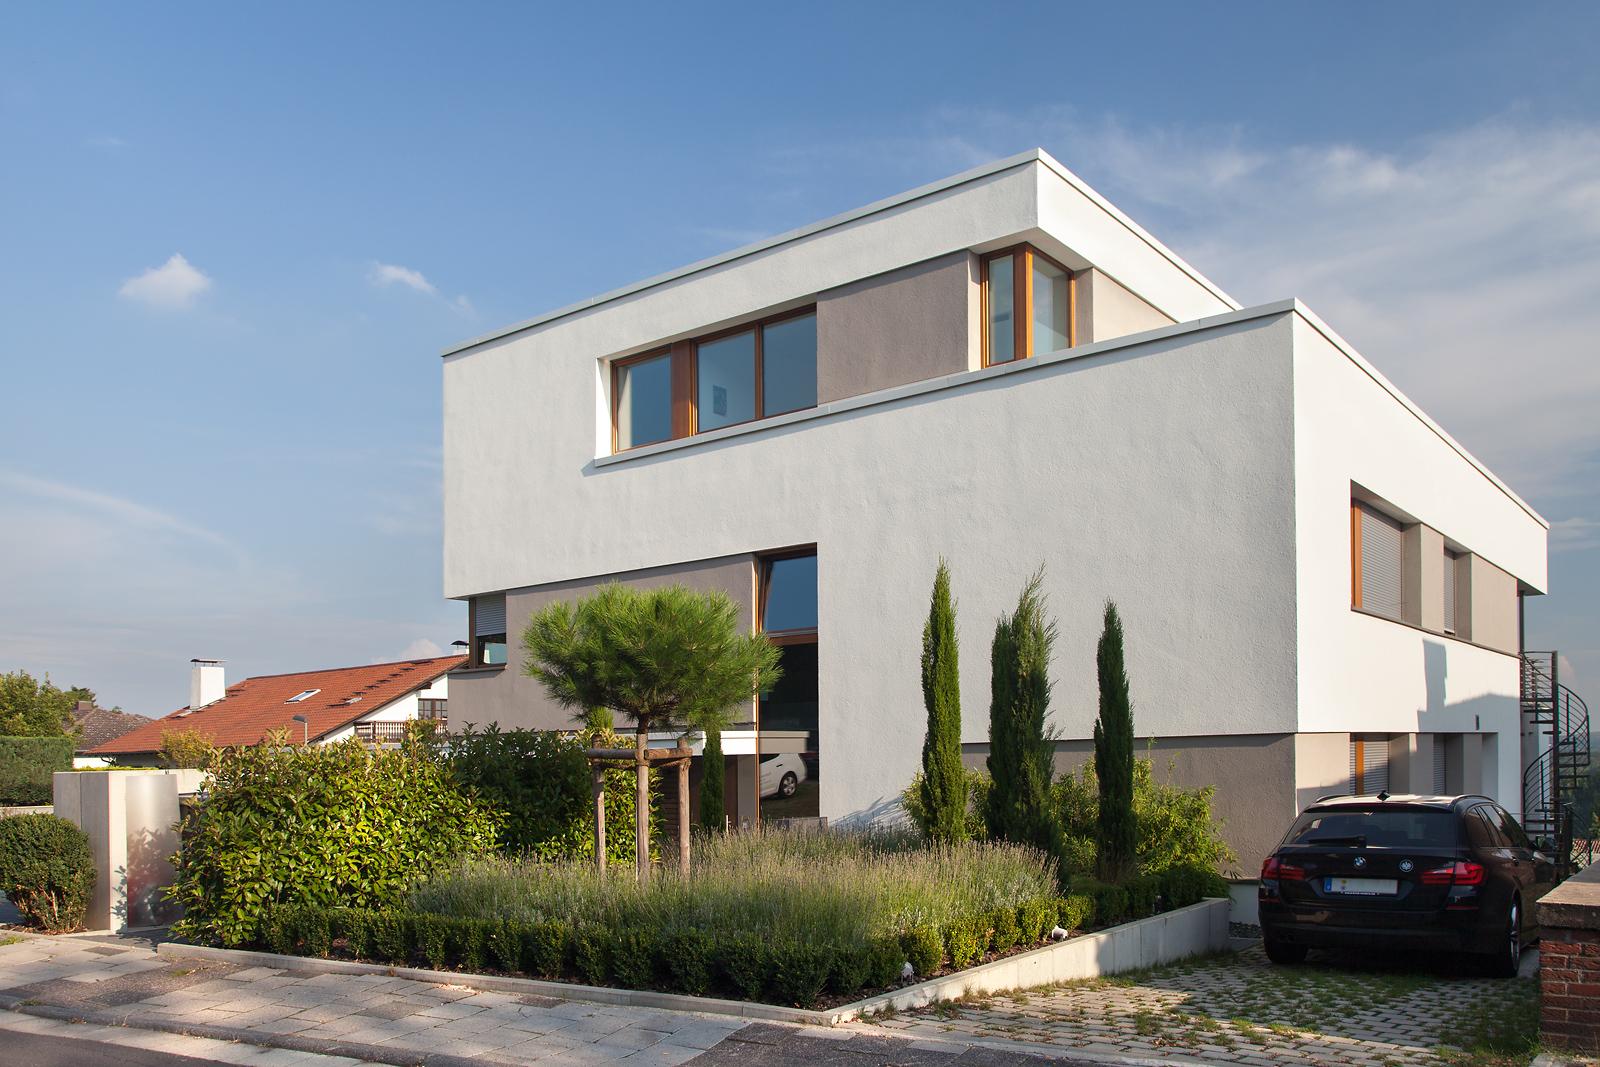 107 mehrfamilienhaus am hang ffm architekten for Mehrfamilienhaus modern